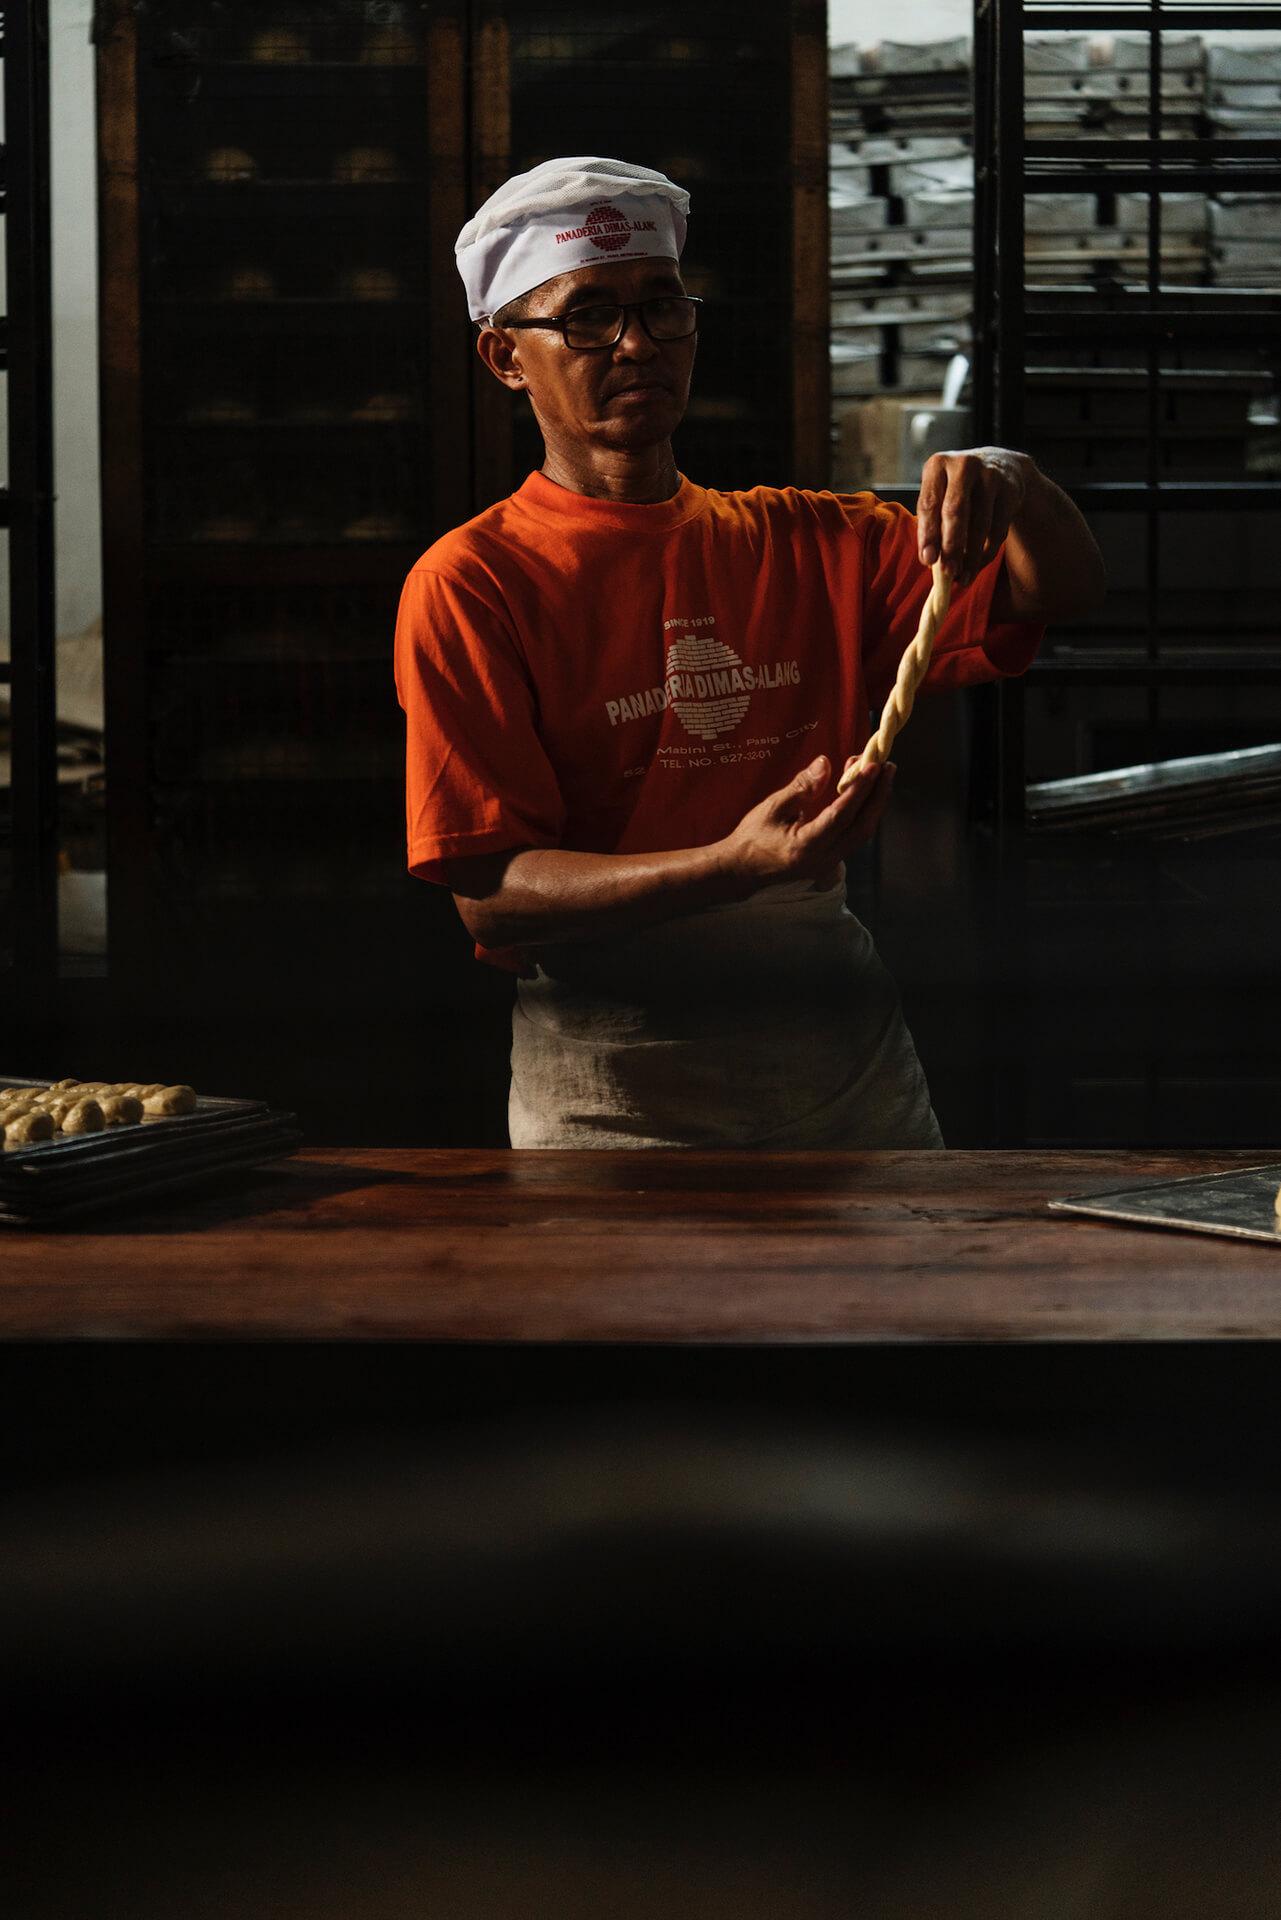 Dominador Caguioa, head baker of Panaderia Dimas-Alang, working with dough